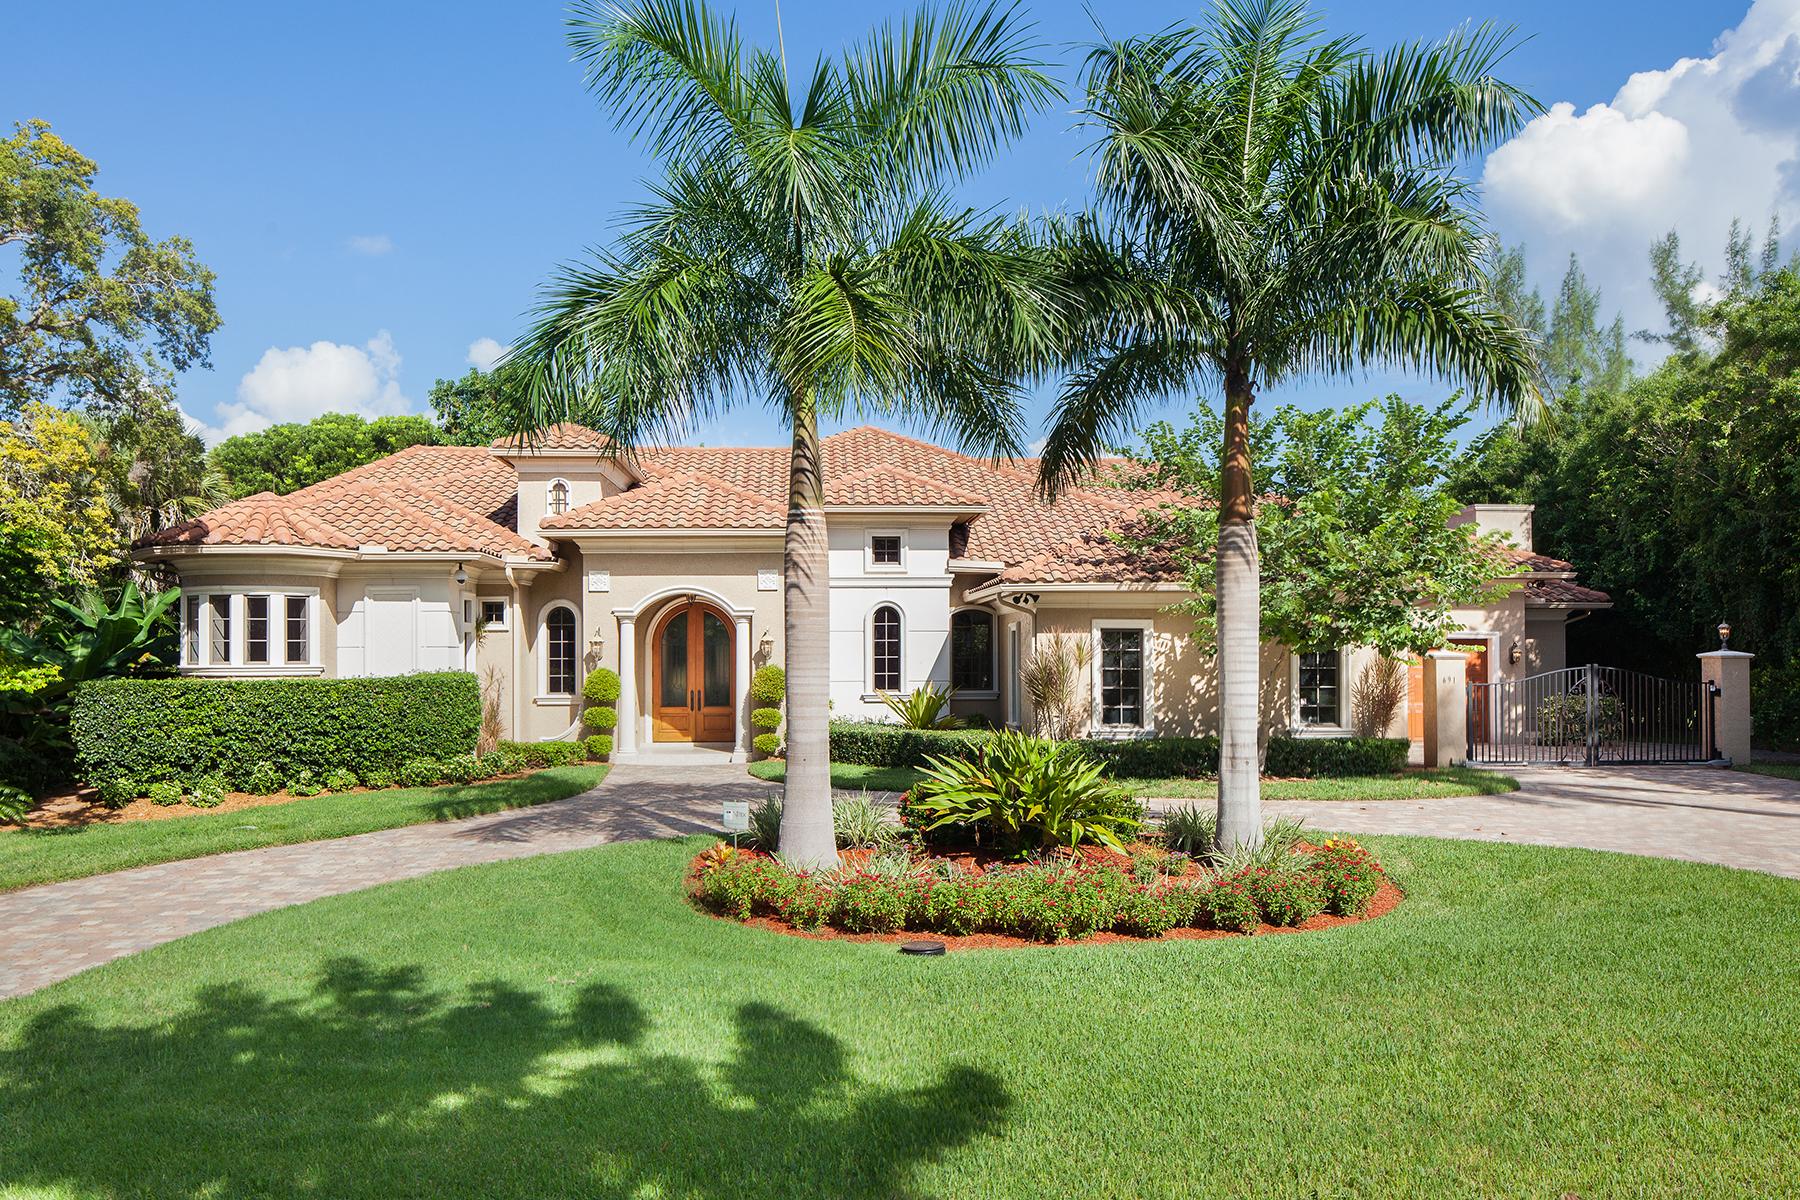 Villa per Vendita alle ore MOORINGS 691 Rudder Rd Naples, Florida, 34102 Stati Uniti